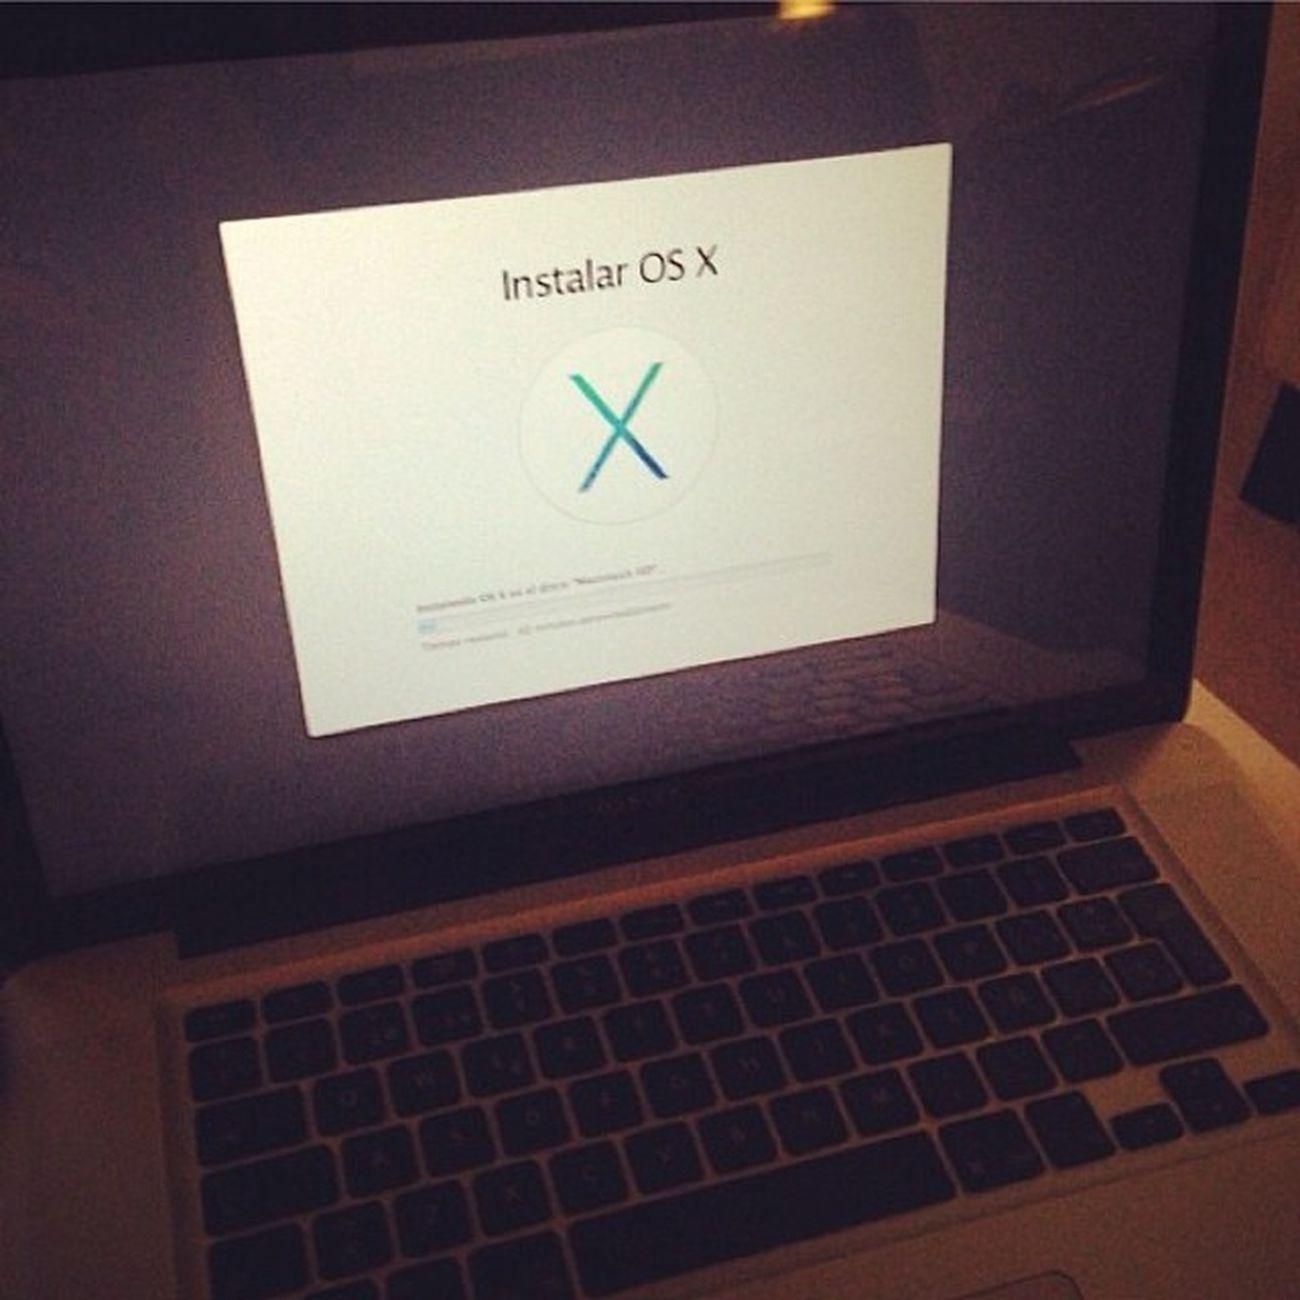 MacBook Iosx Instamoment